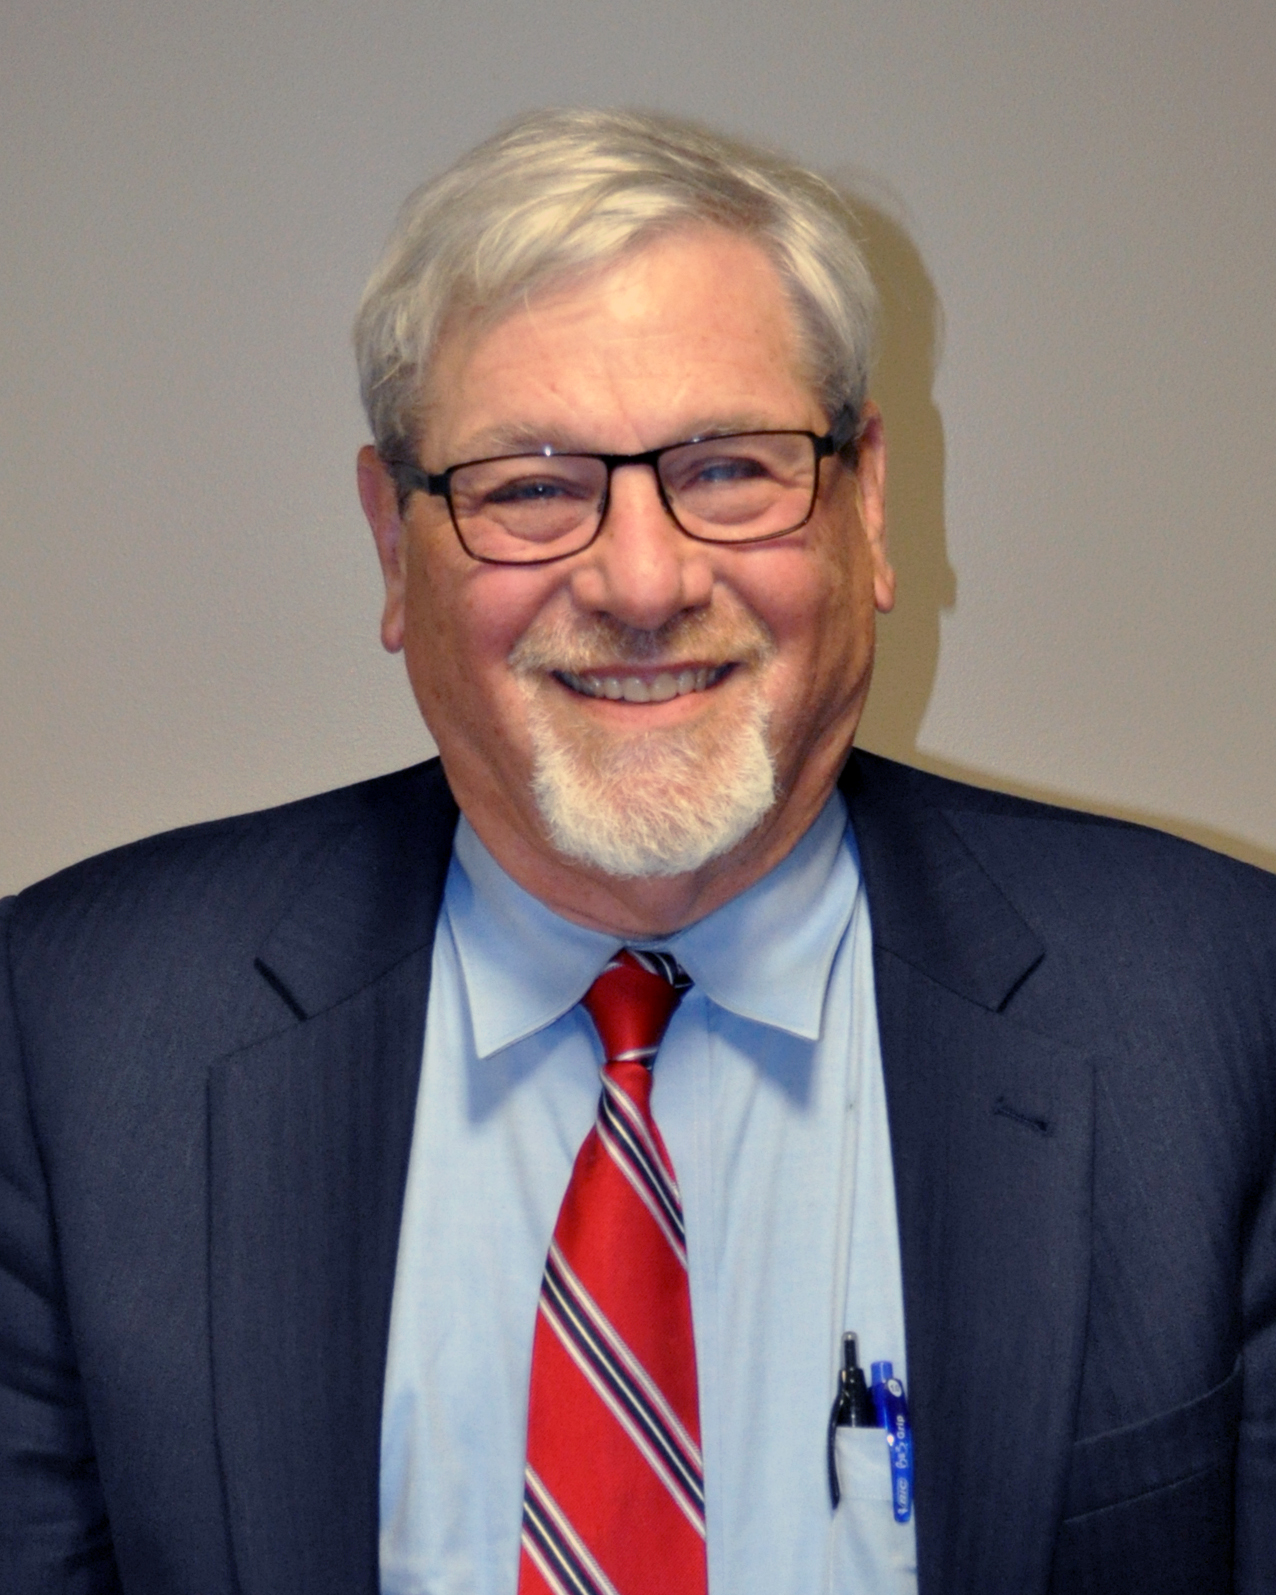 R. Michael Goldman